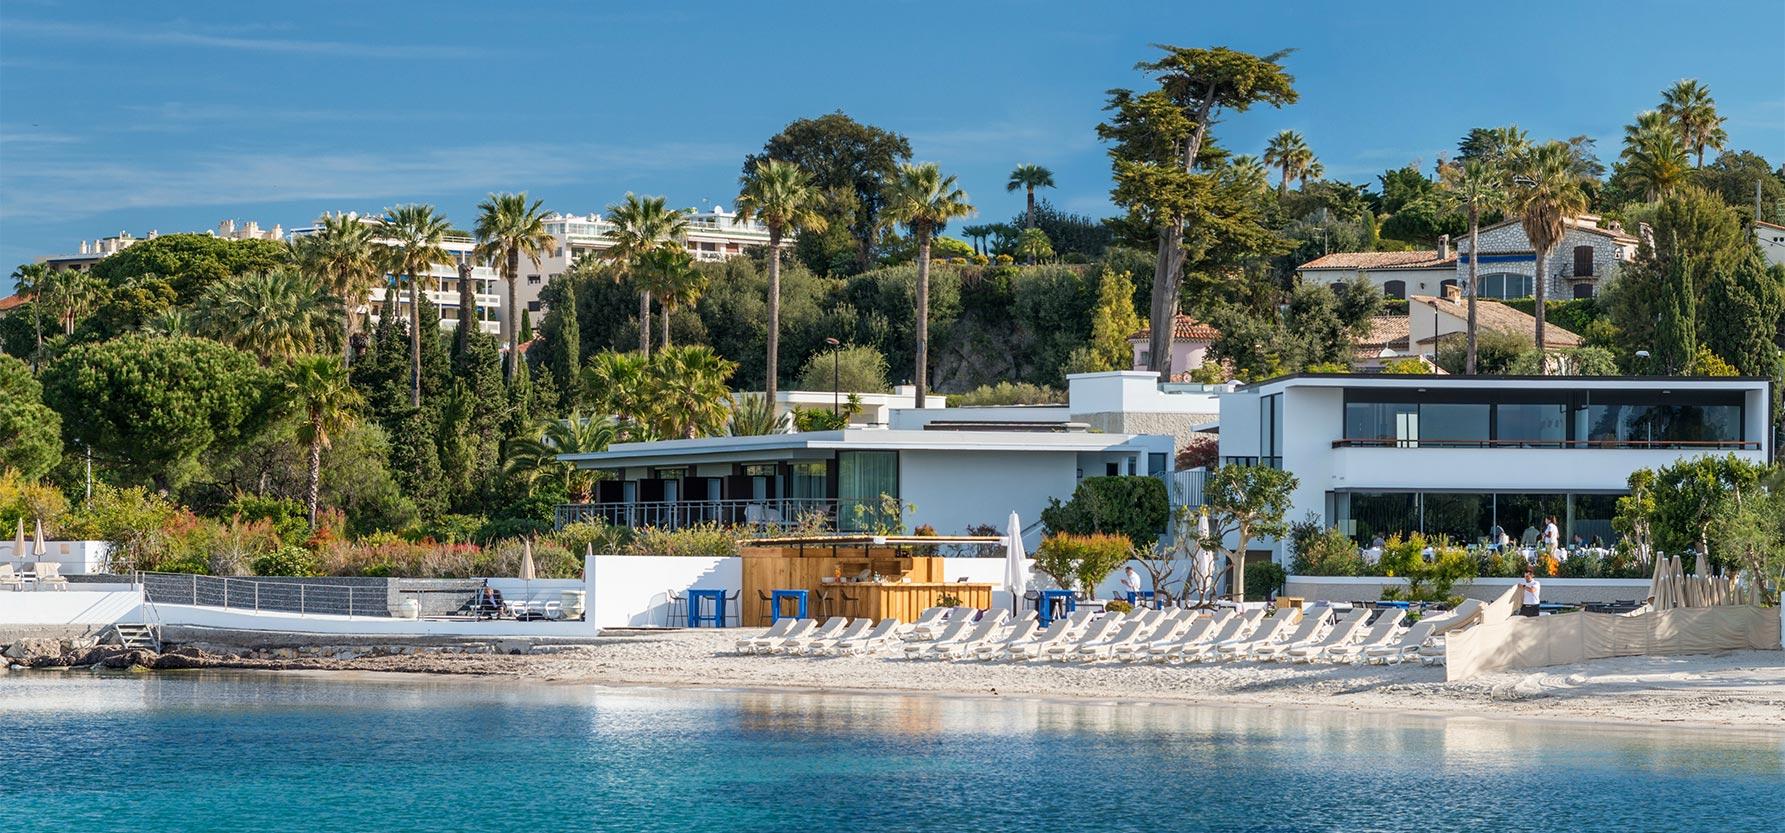 cap-antibes-beach-hotel